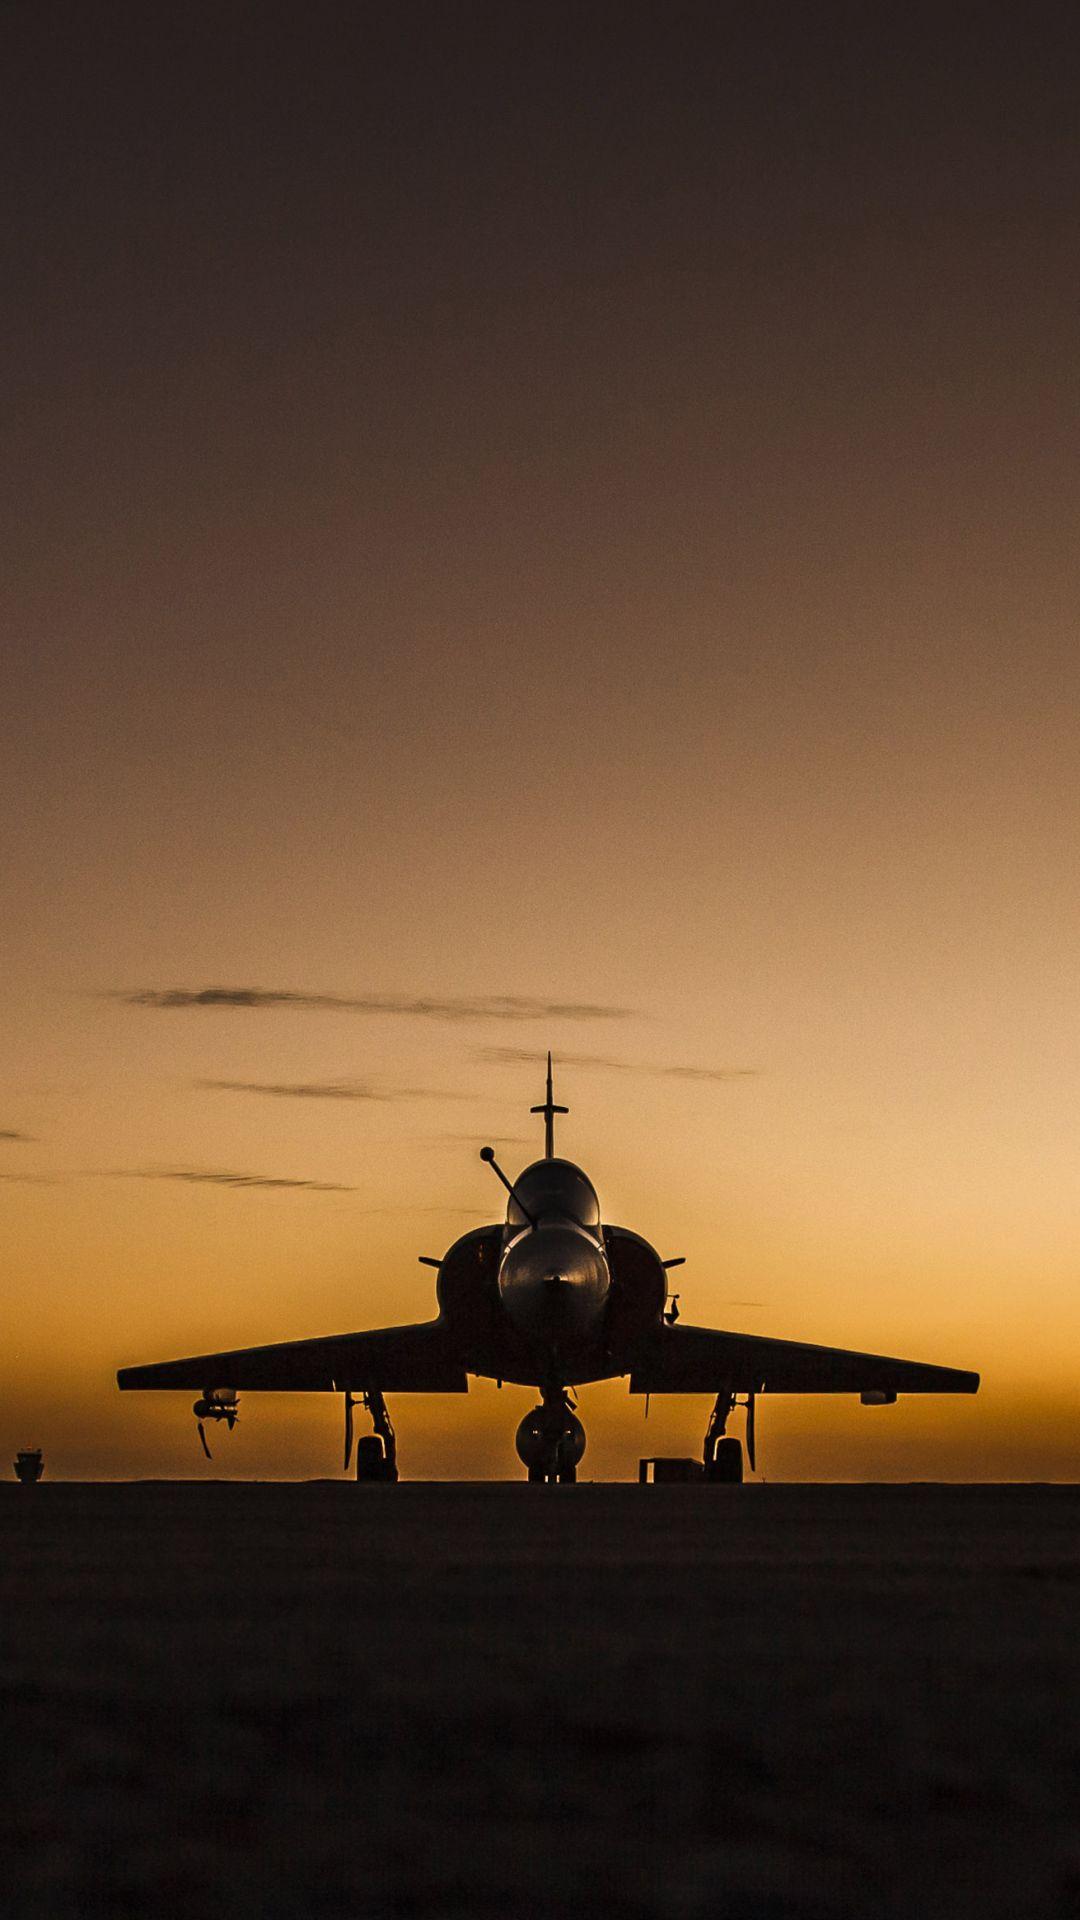 Military Dassault Mirage 2000 1080x1920 Mobile Wallpaper